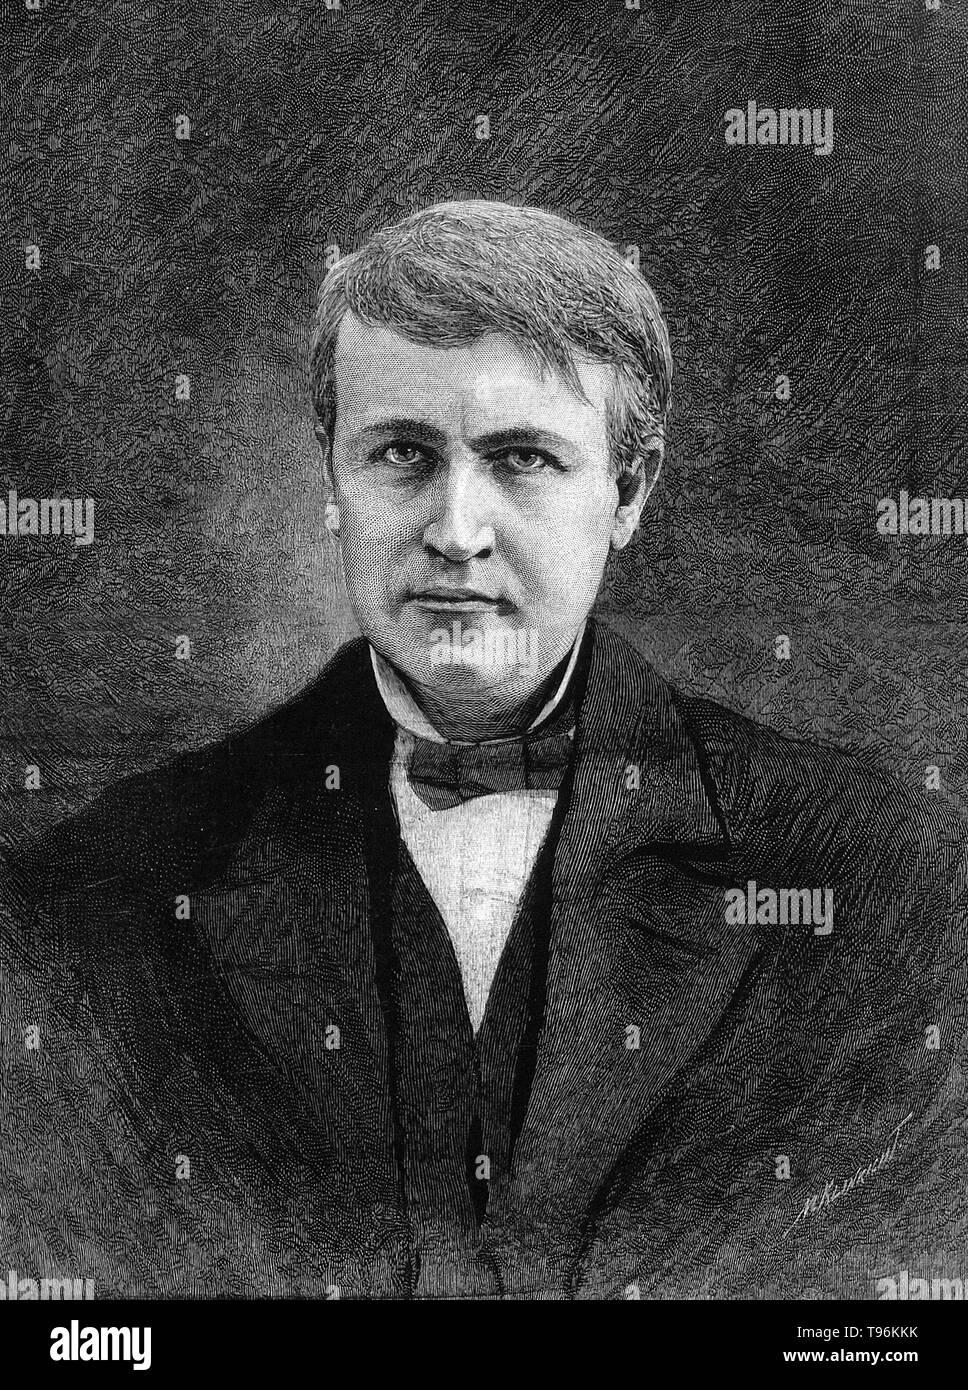 Thomas Alva Edison February 11 1847 October 18 1931